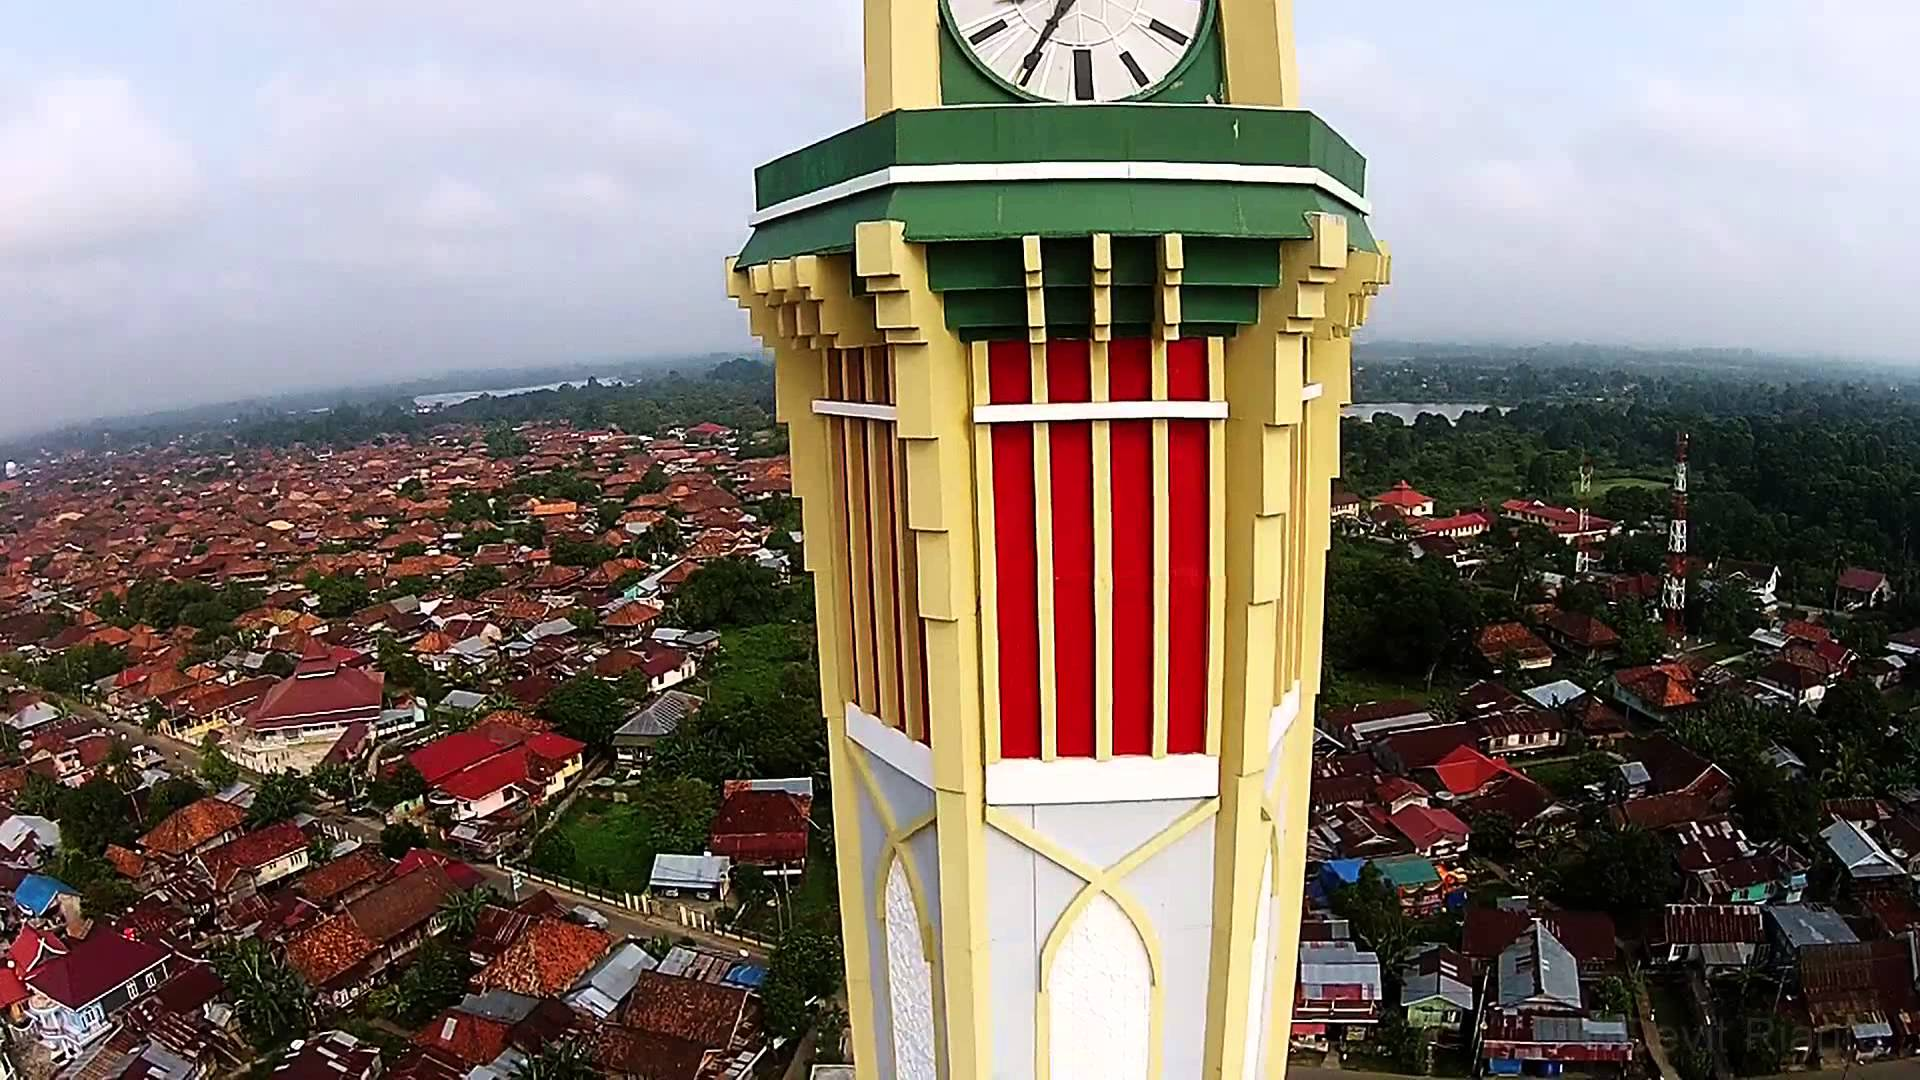 Menara Gentala Arasy Youtube Kota Jambi